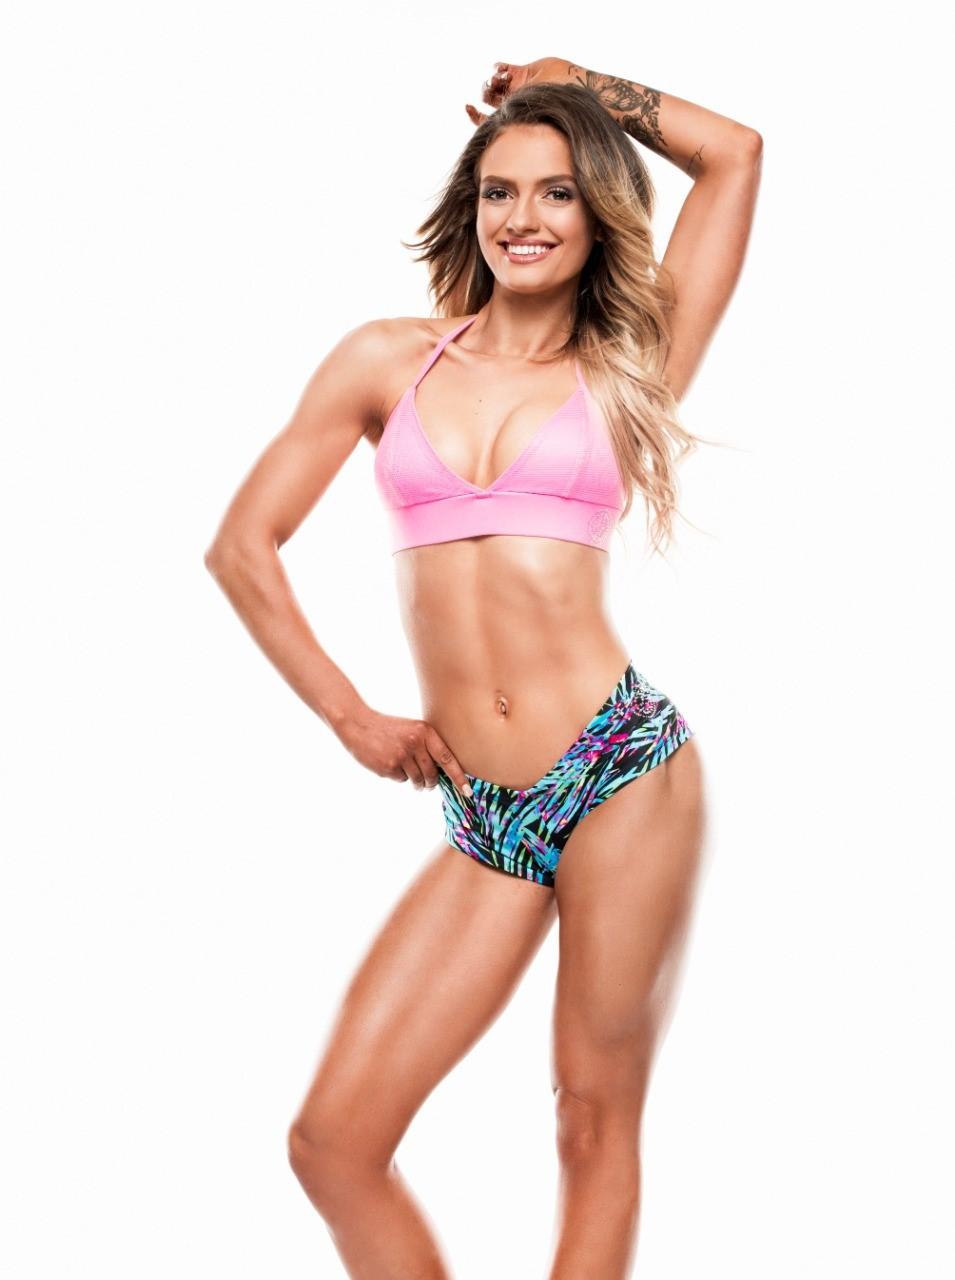 What do IFBB Bikini Competitors eat?